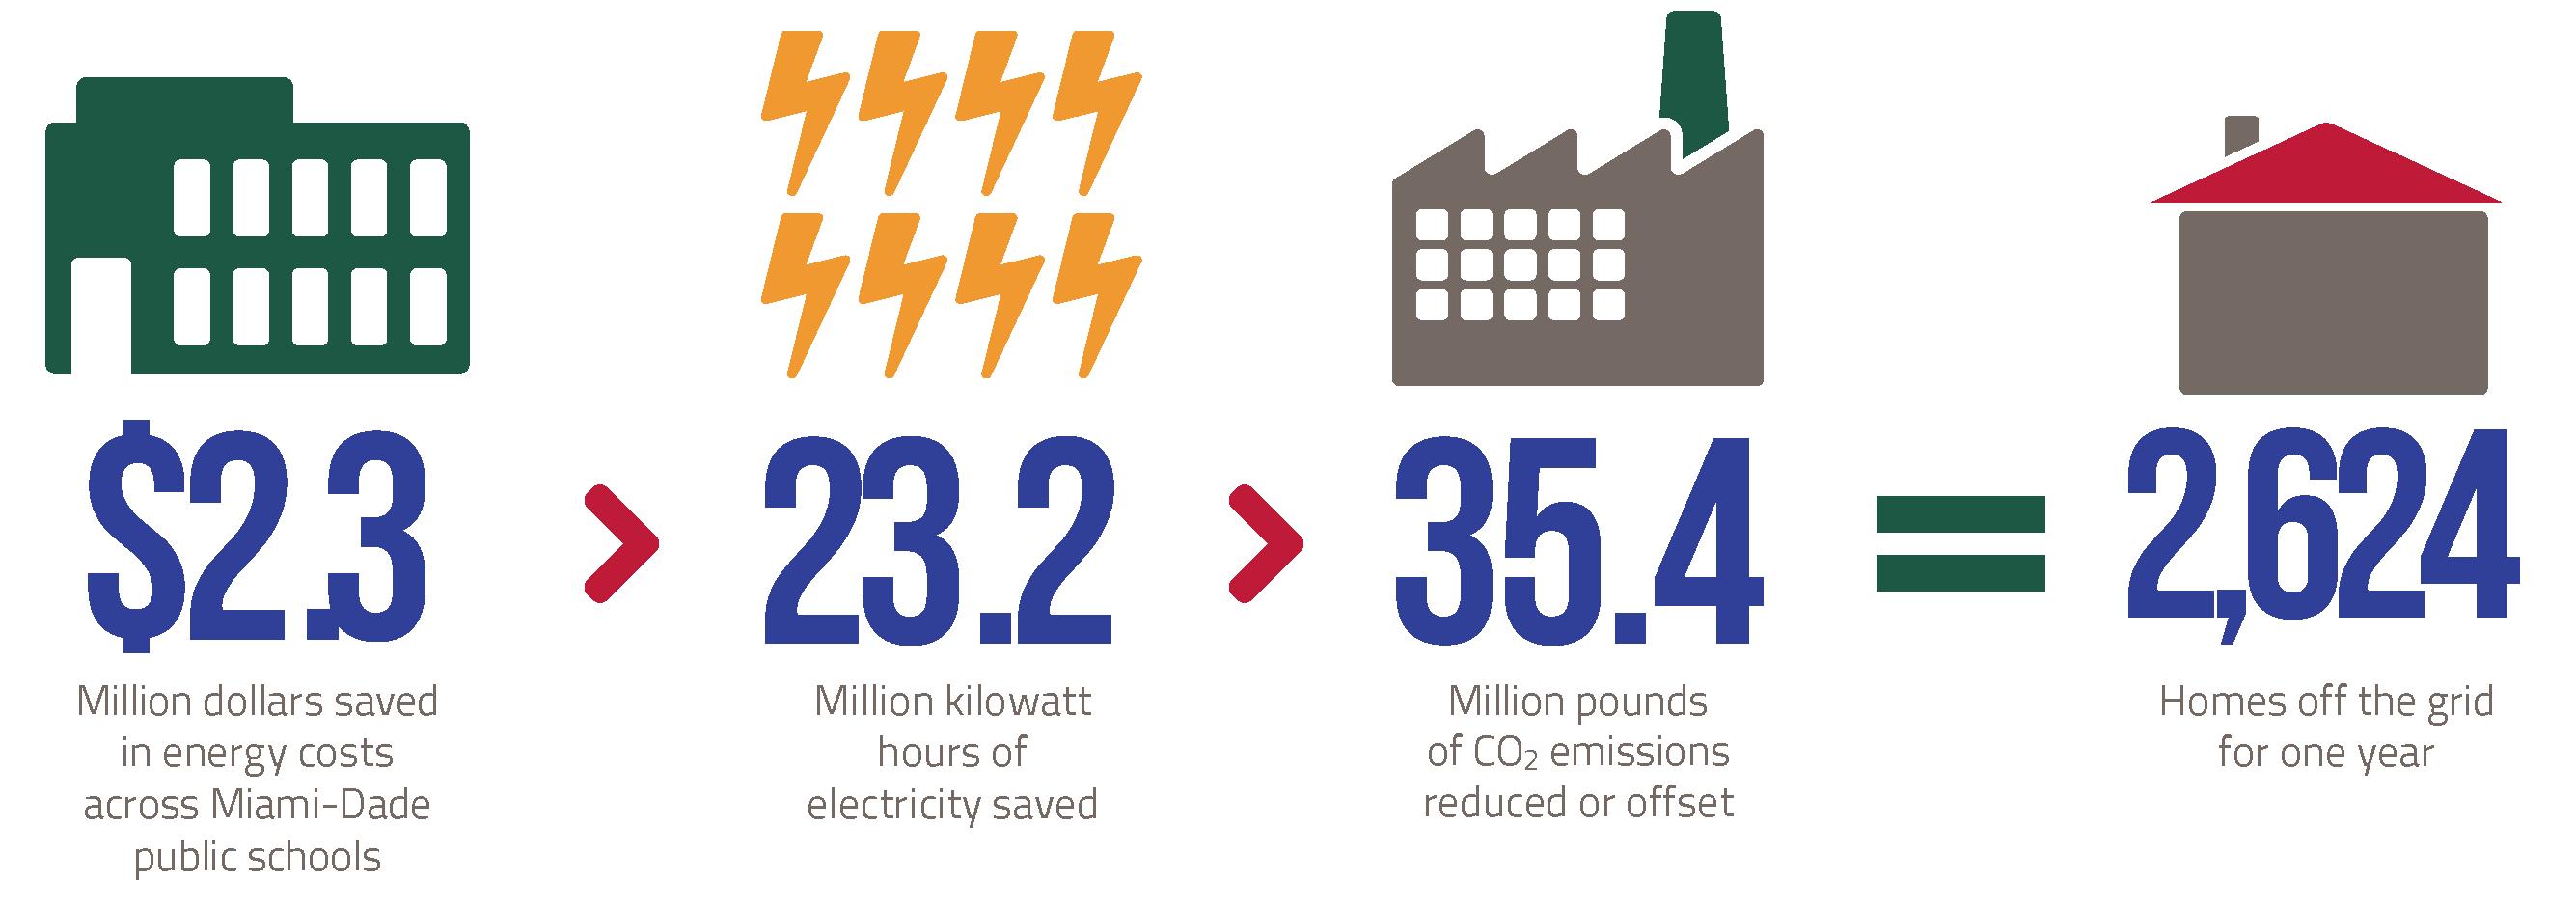 GSC savings infographic_2015-16